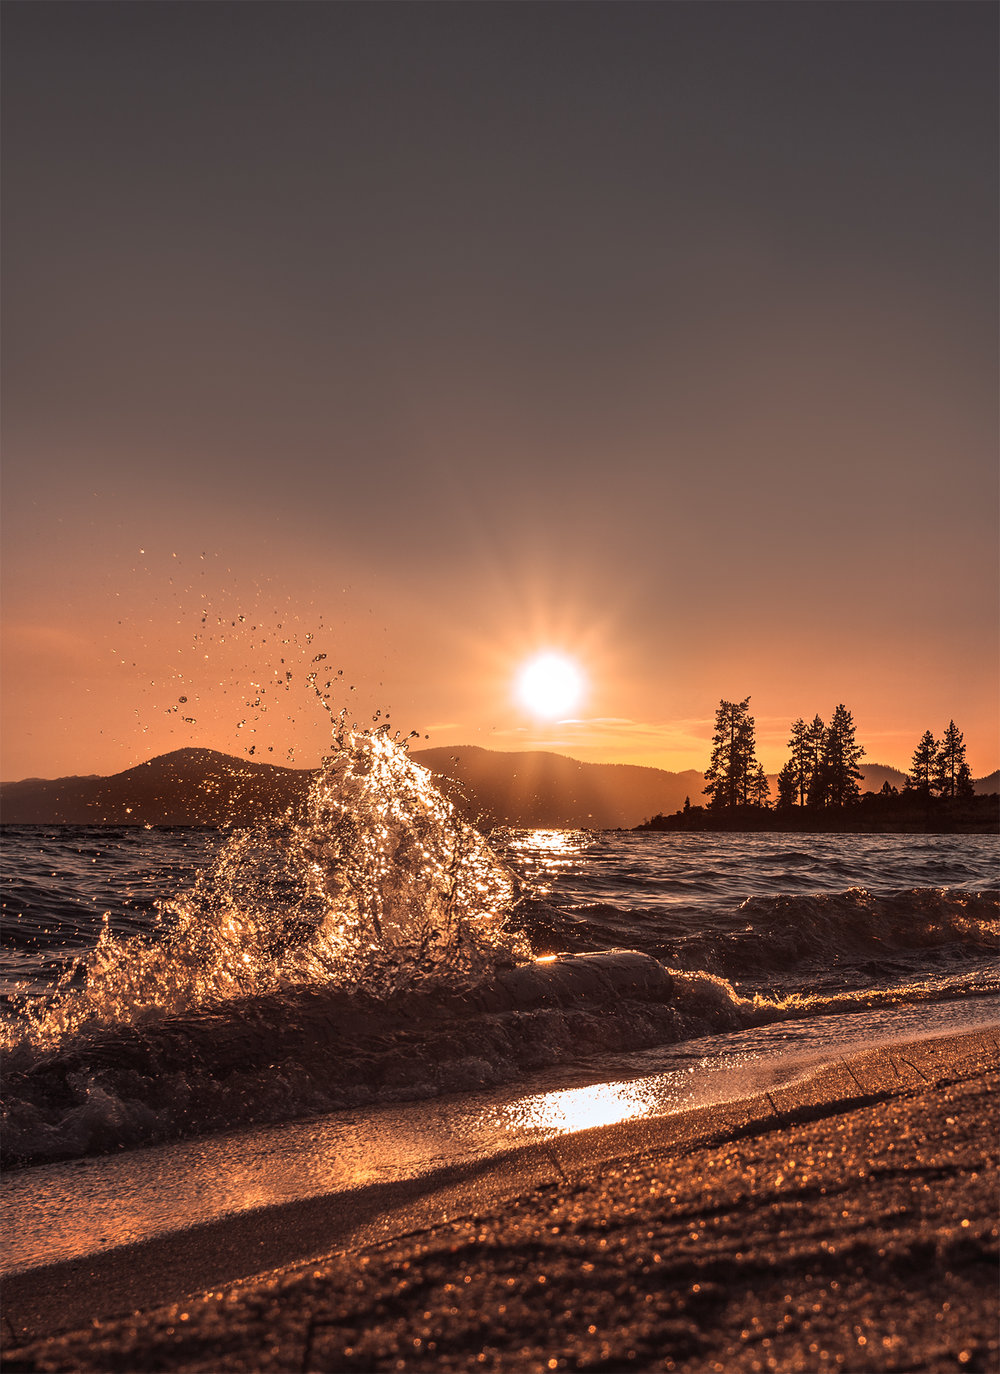 lake_tahoe_sand_harbor_wave_01.jpg